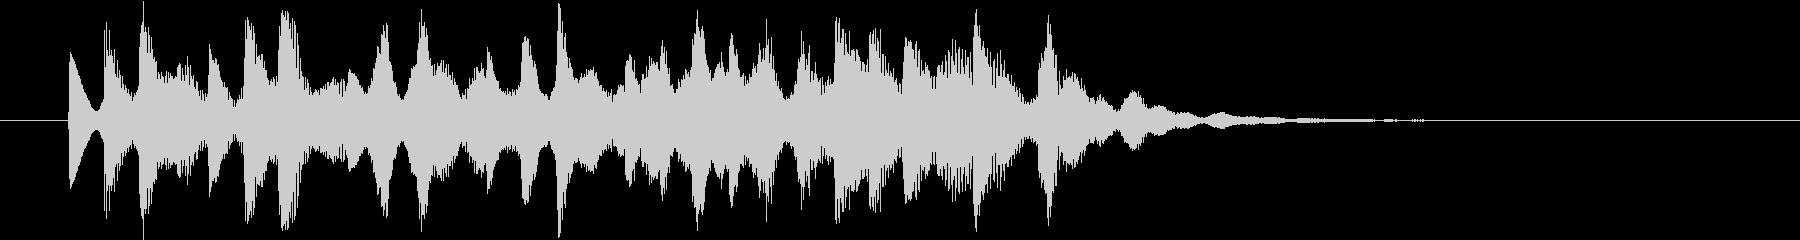 FMシンセの発車メロディ風の短いフレーズの未再生の波形